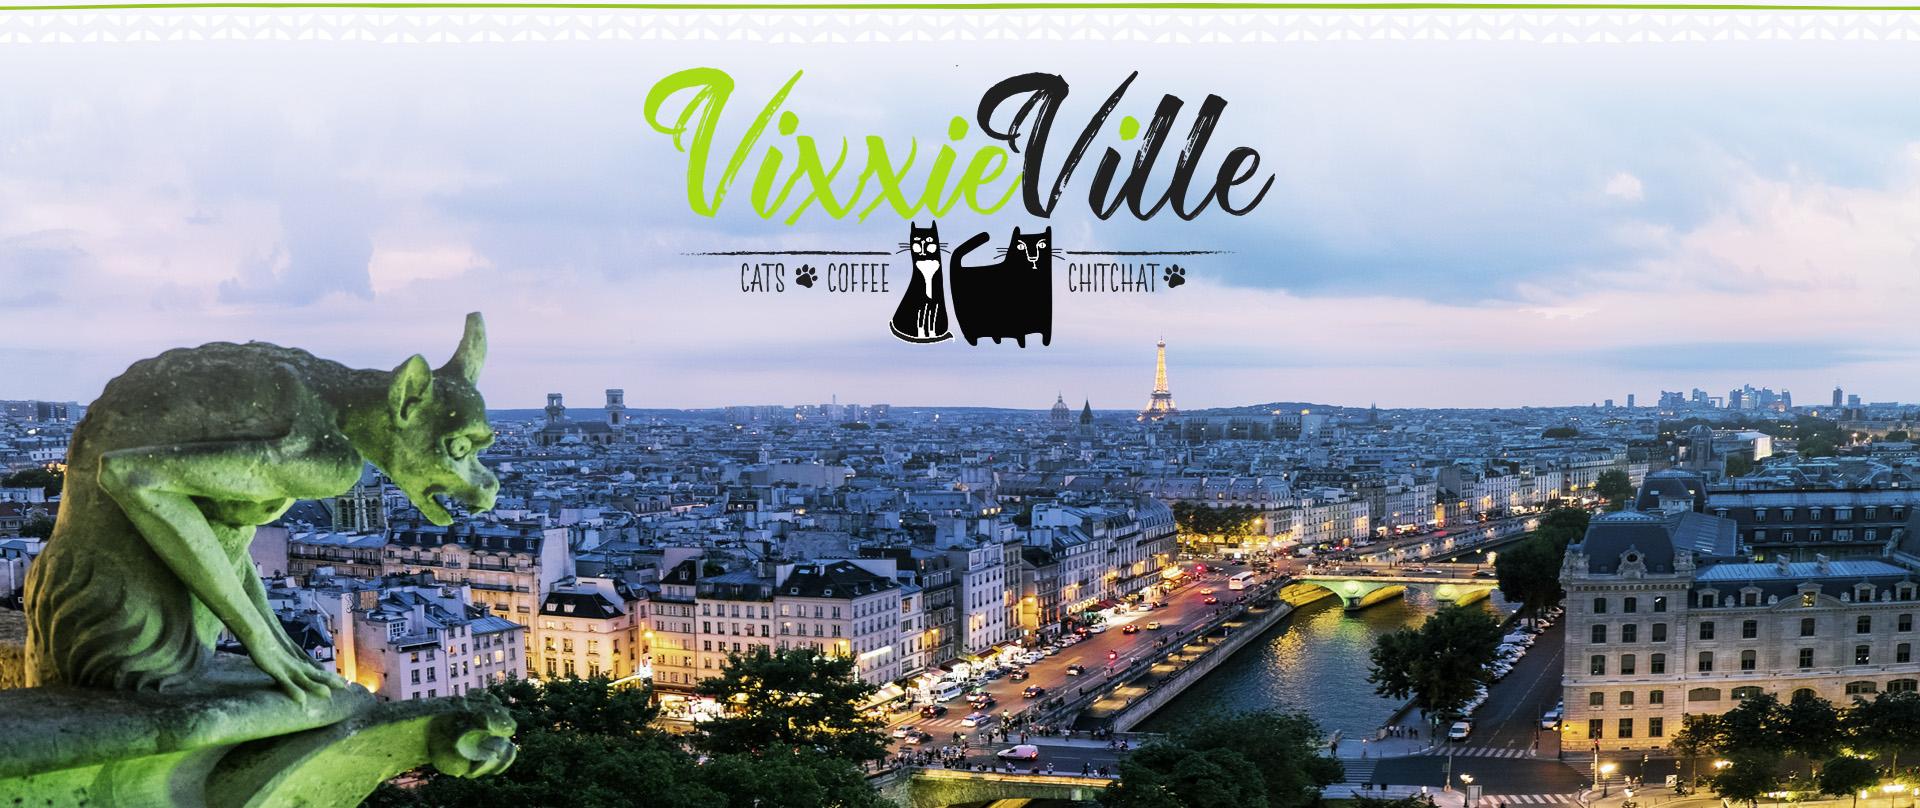 paris-withlogo